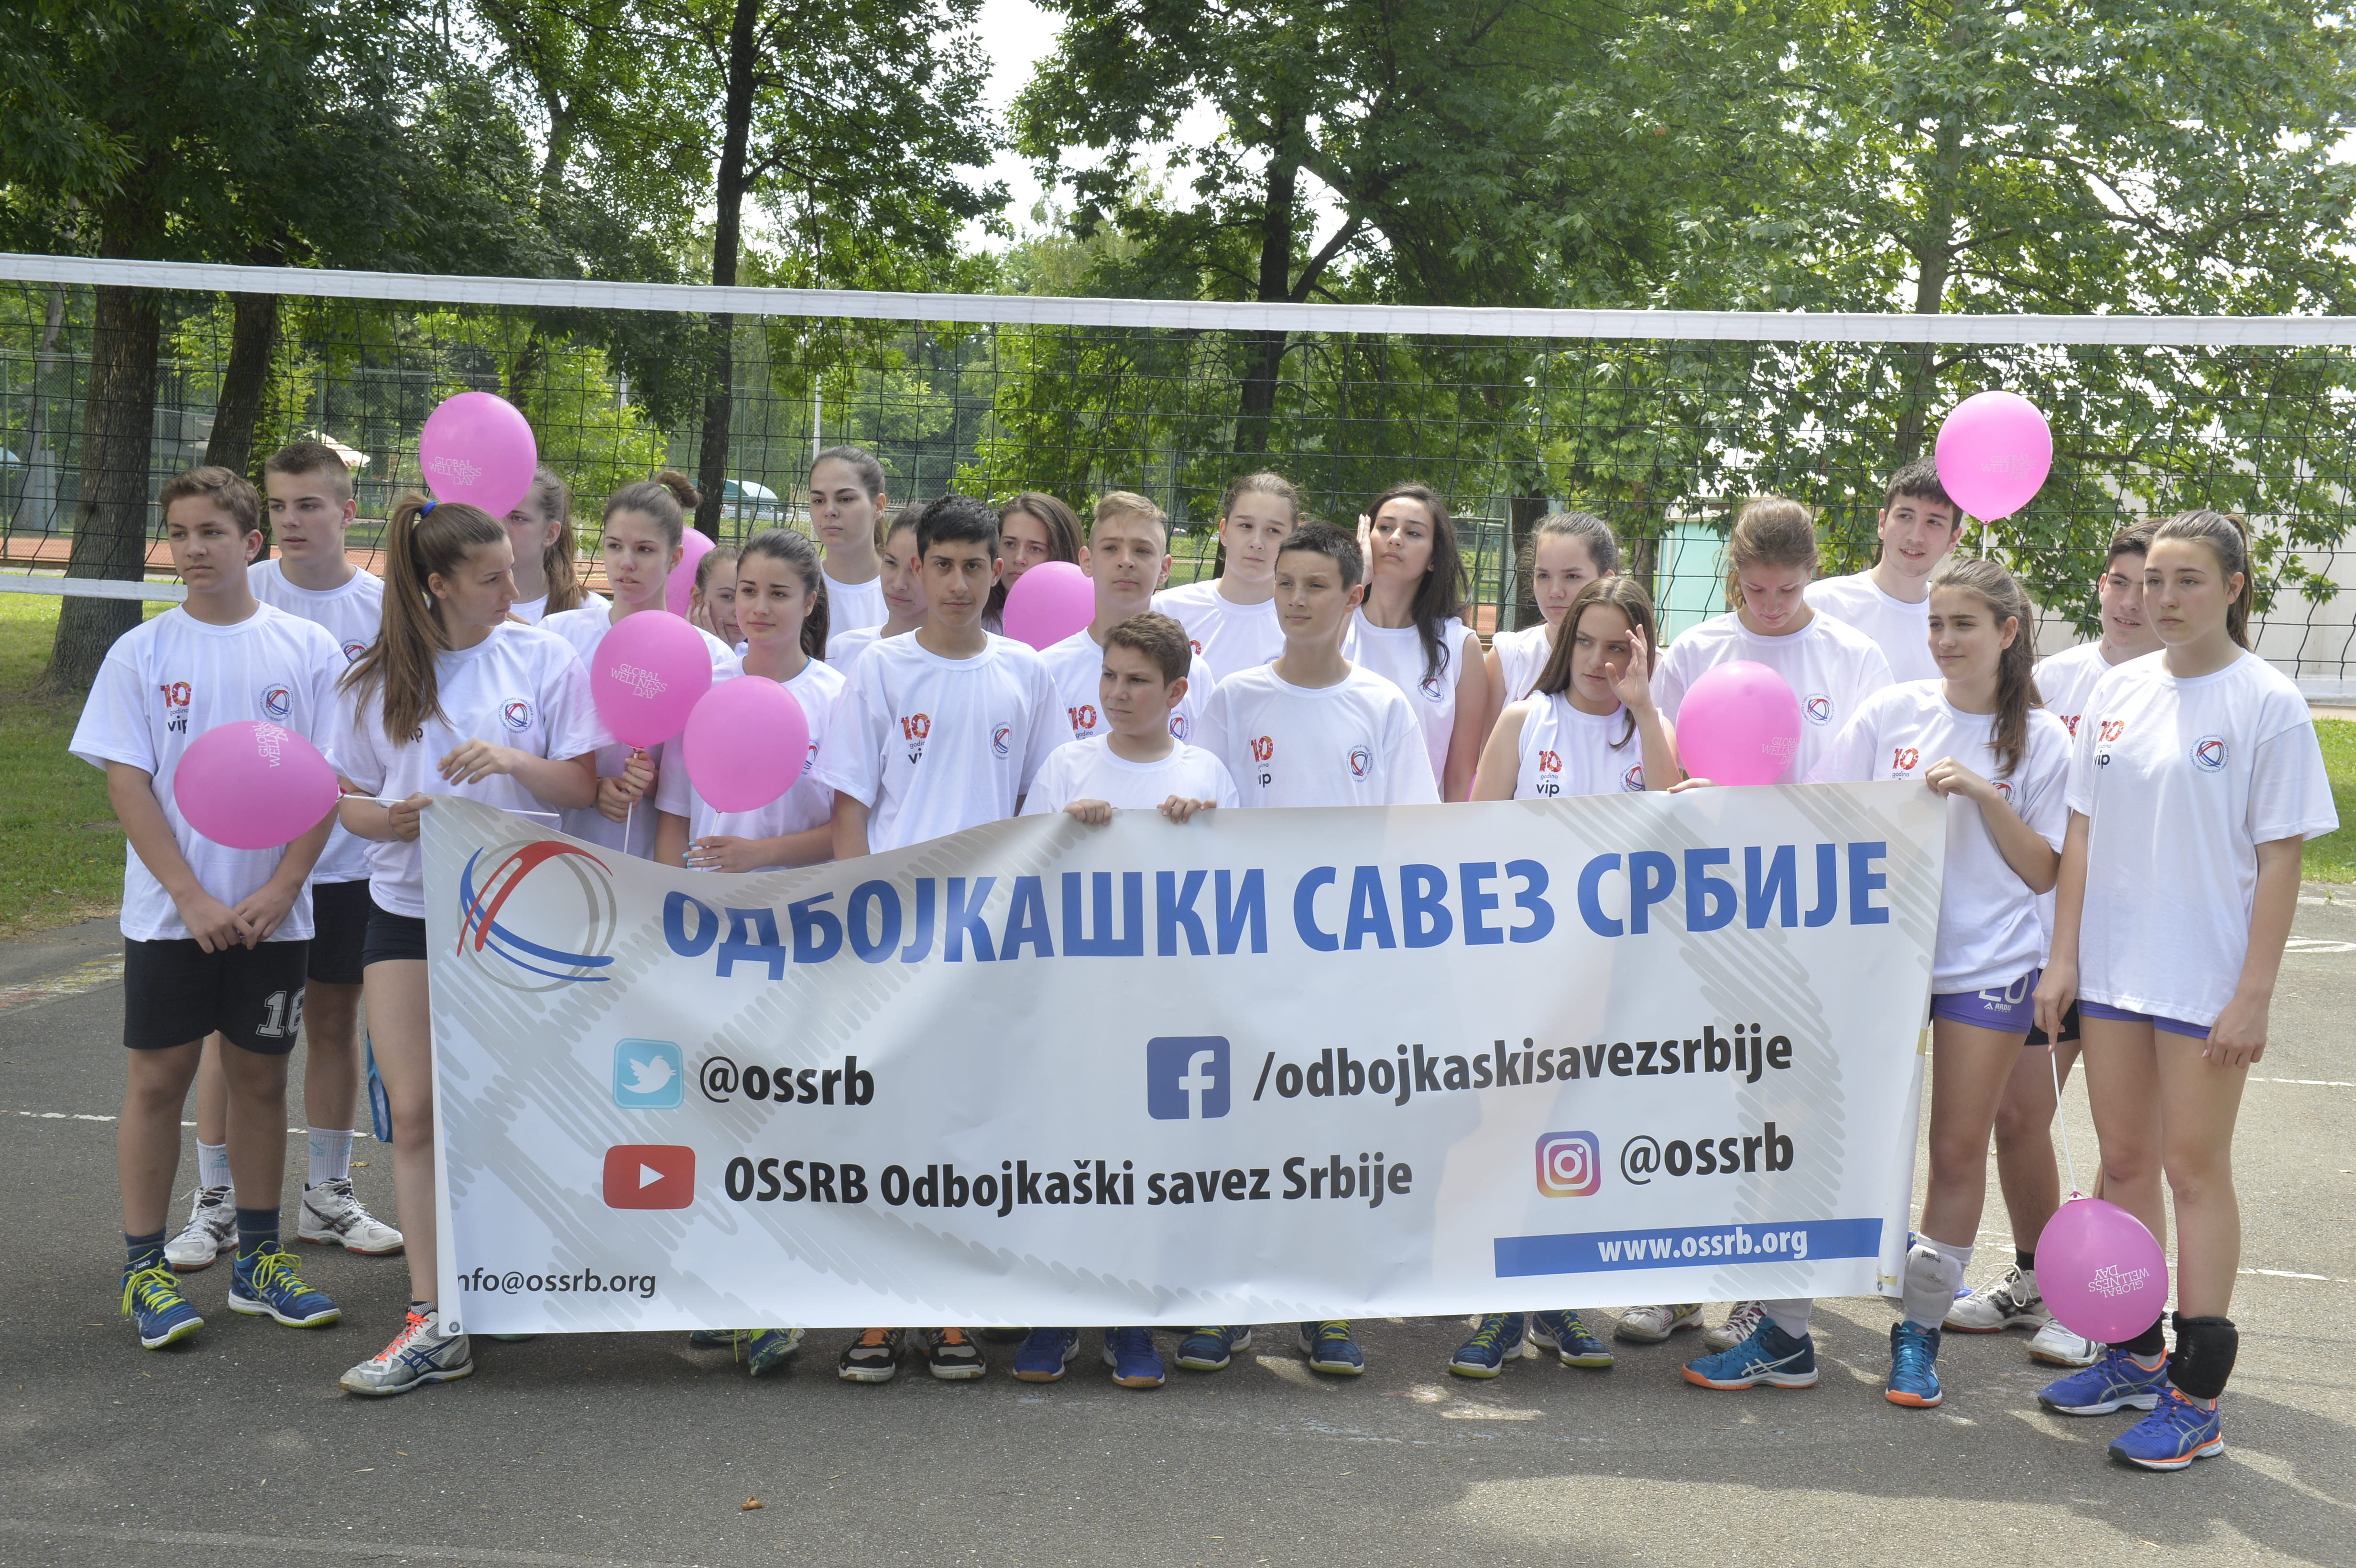 Odbojkaški savez Srbije na Svetskom danu velnesa na Adi Ciganliji